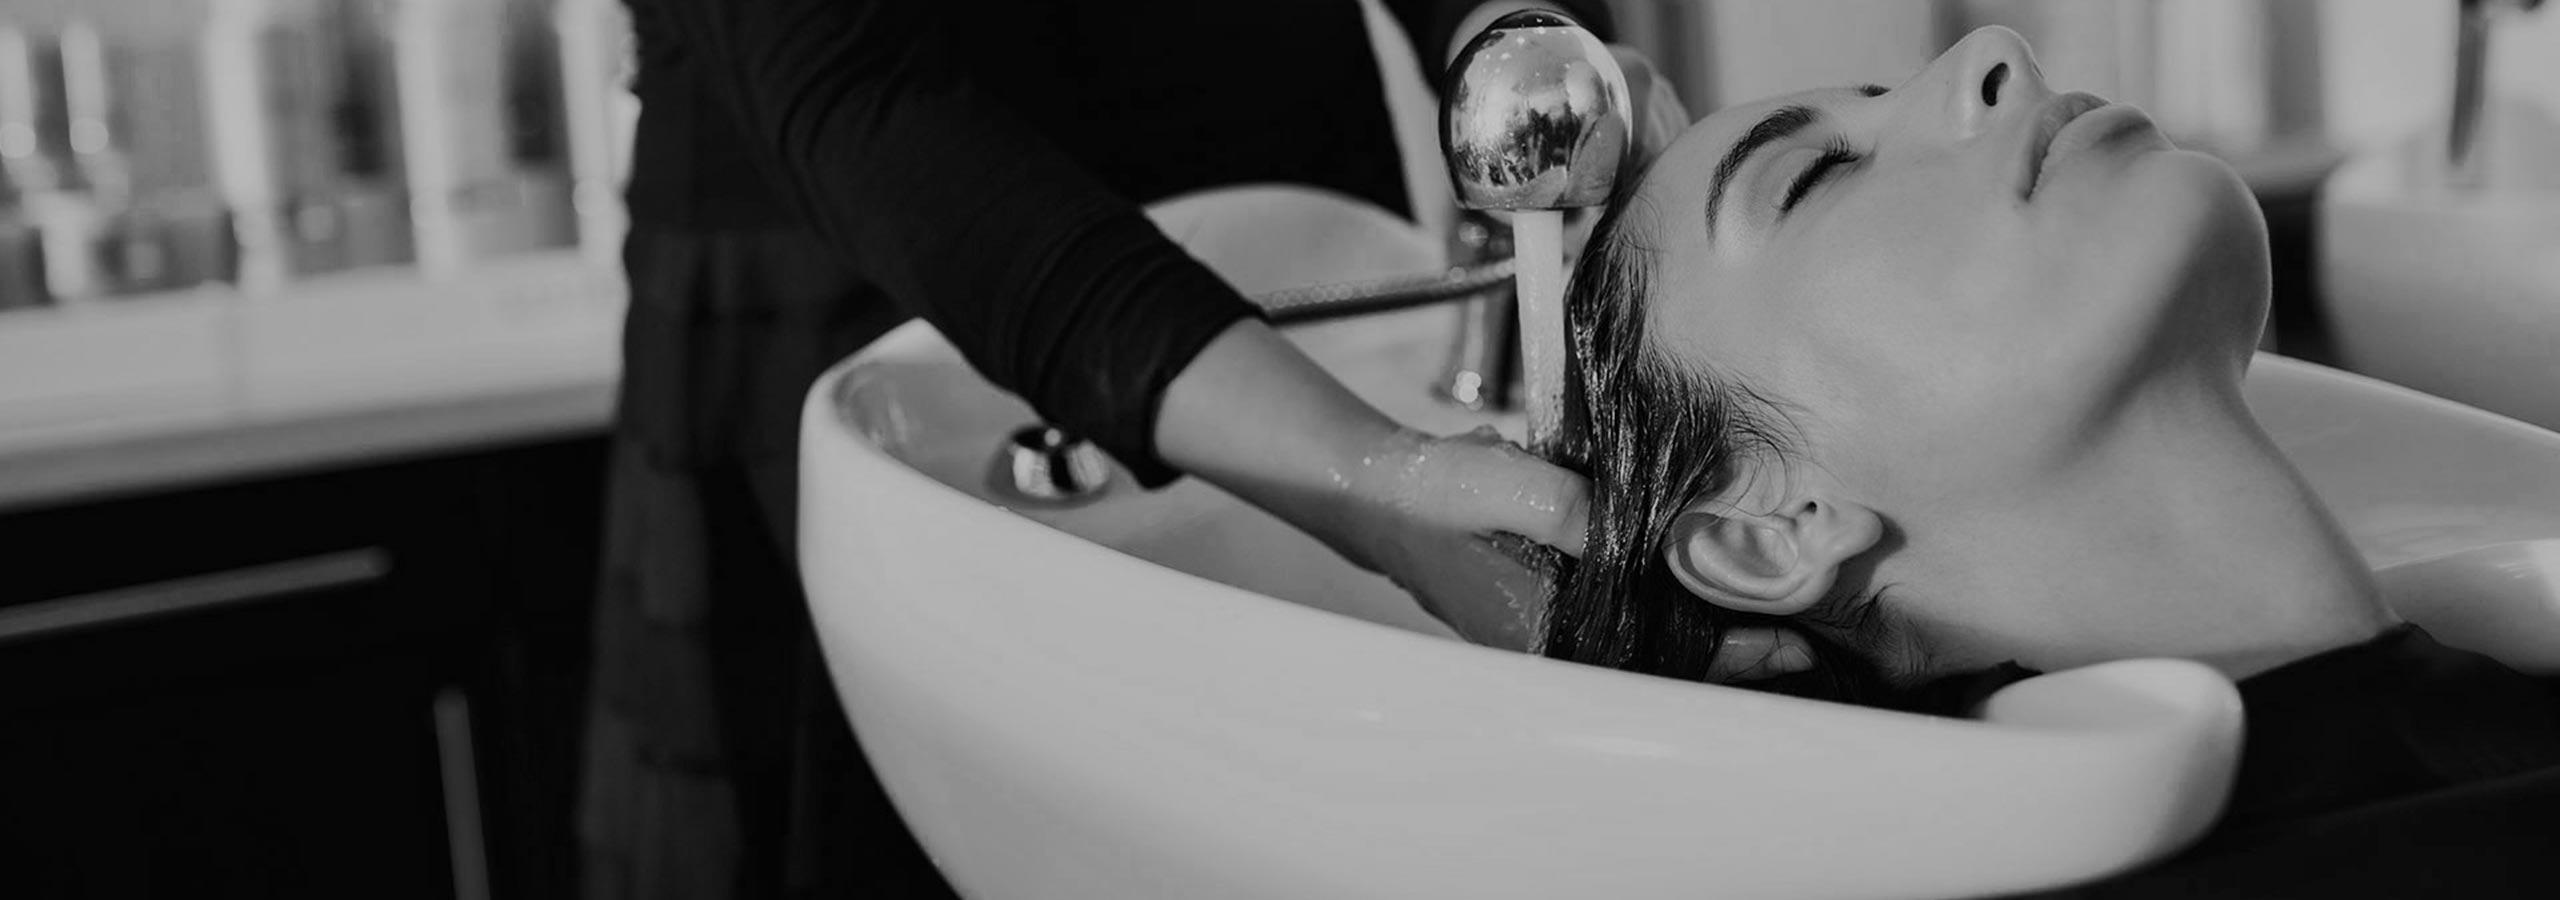 Services at Design Ramon Hair Studio in Ahwatukee | 480 763 5588